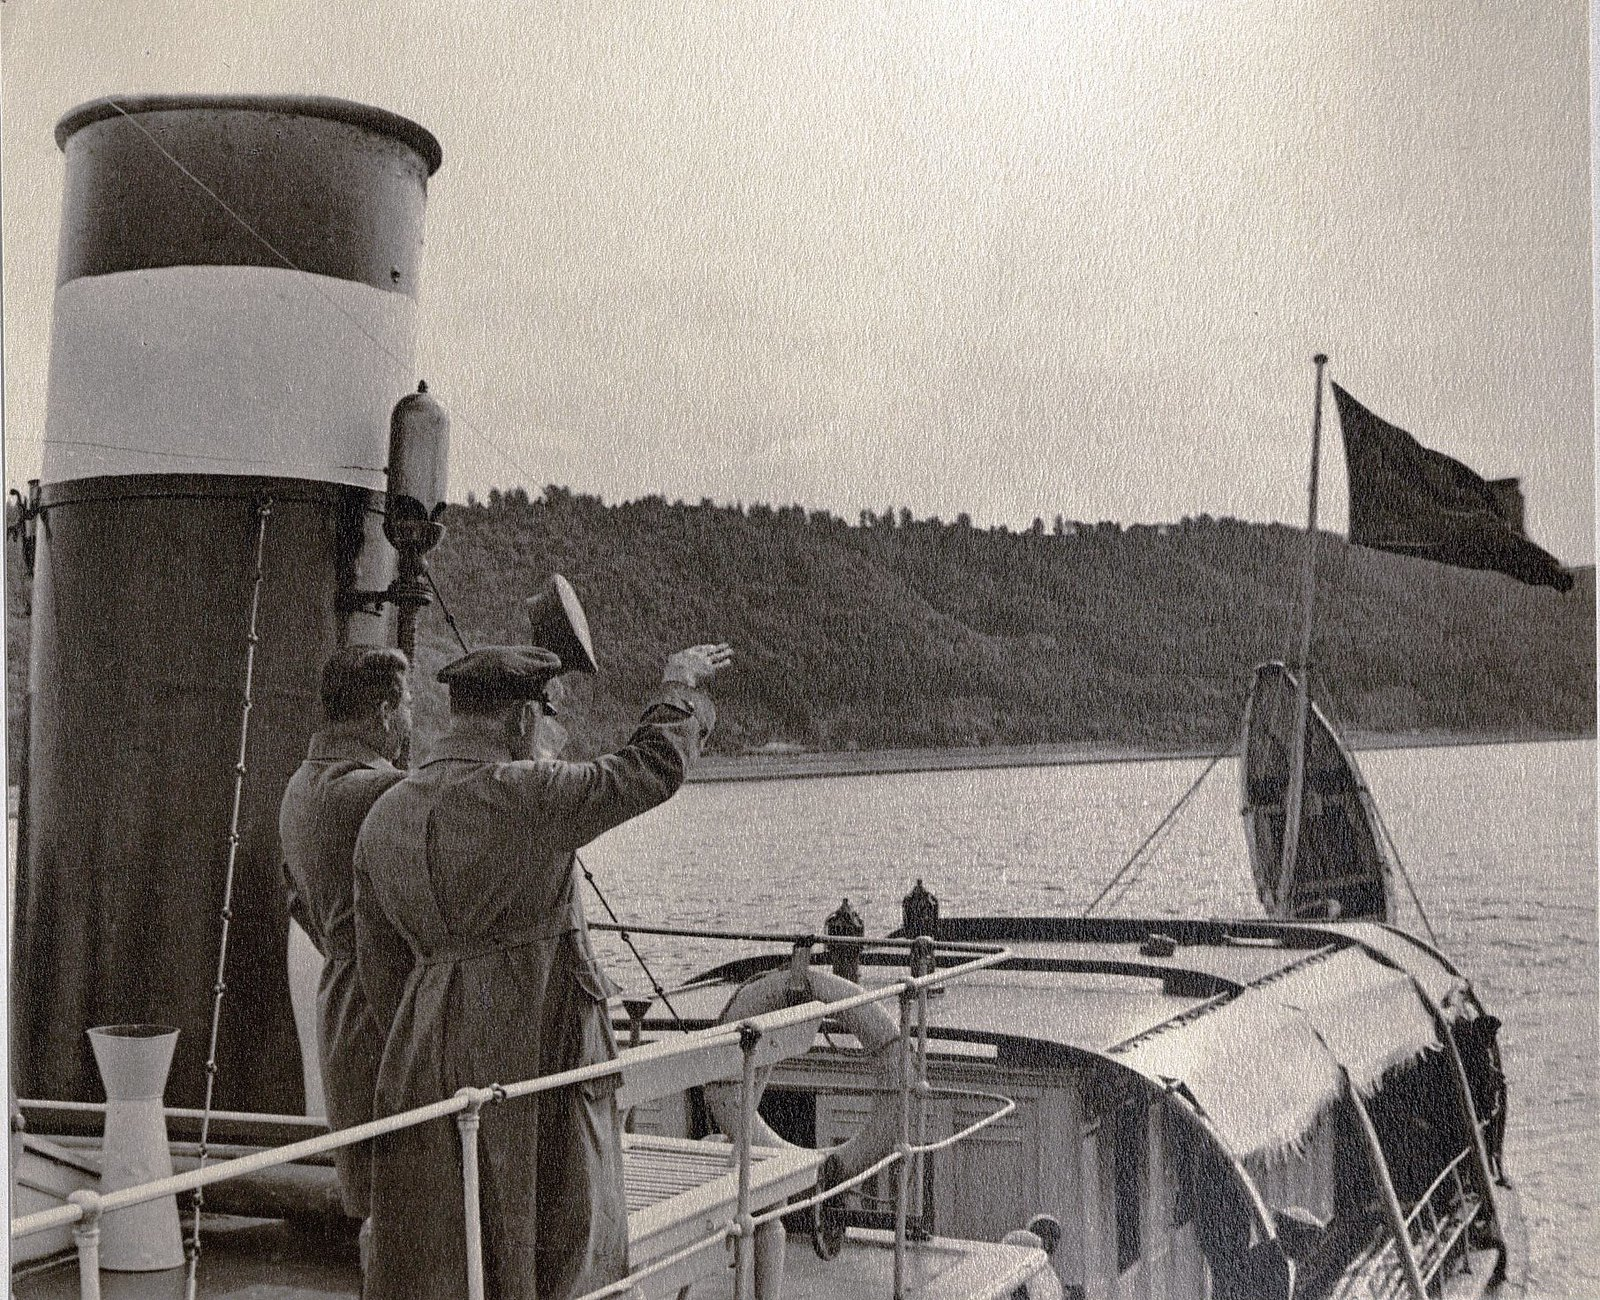 16. И.В. Сталин и К.Е. Ворошилов. Теплоход Клара Цеткин. Август 1933